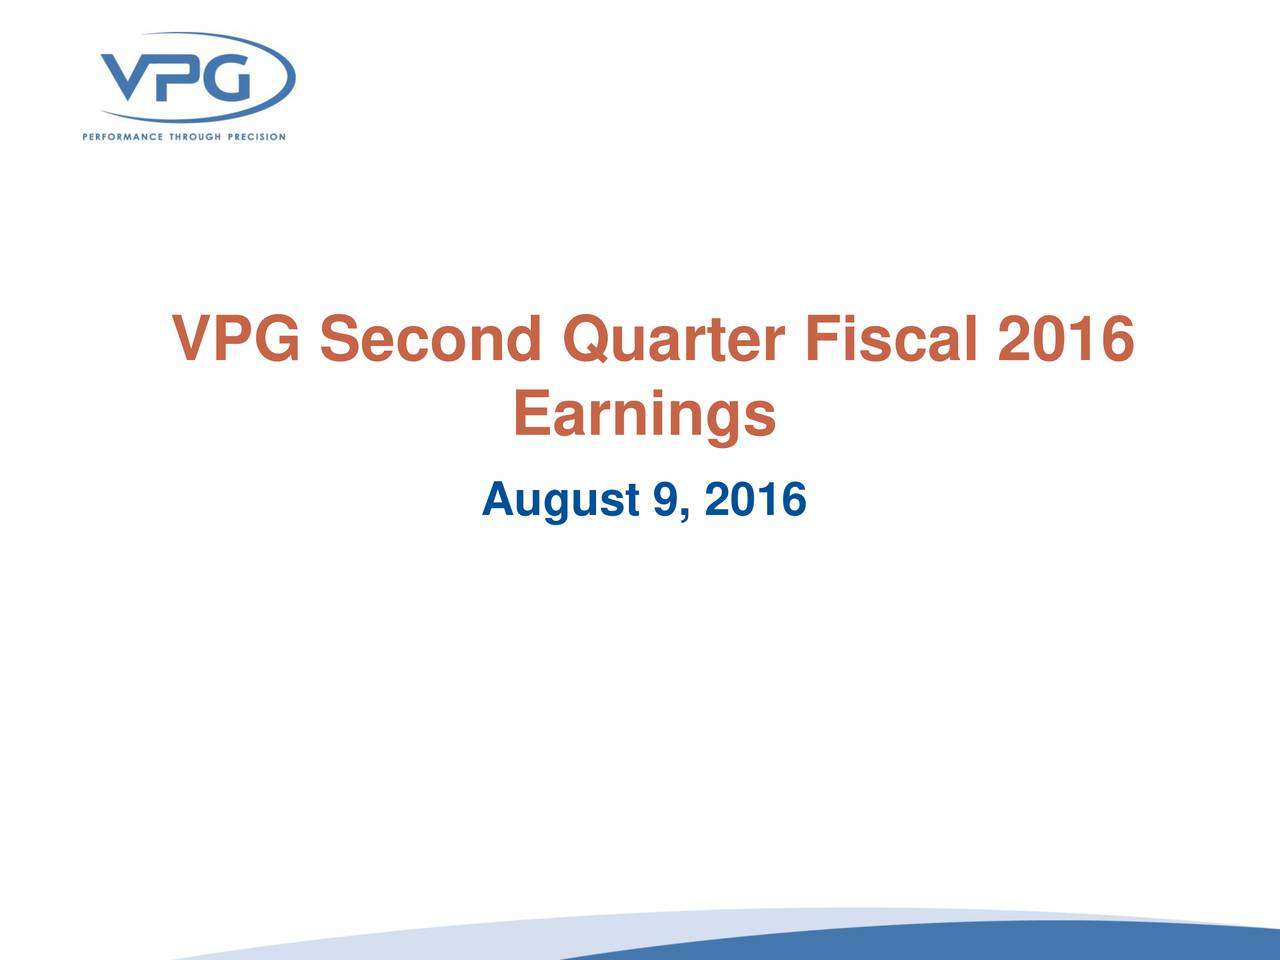 Earnings August 9, 2016